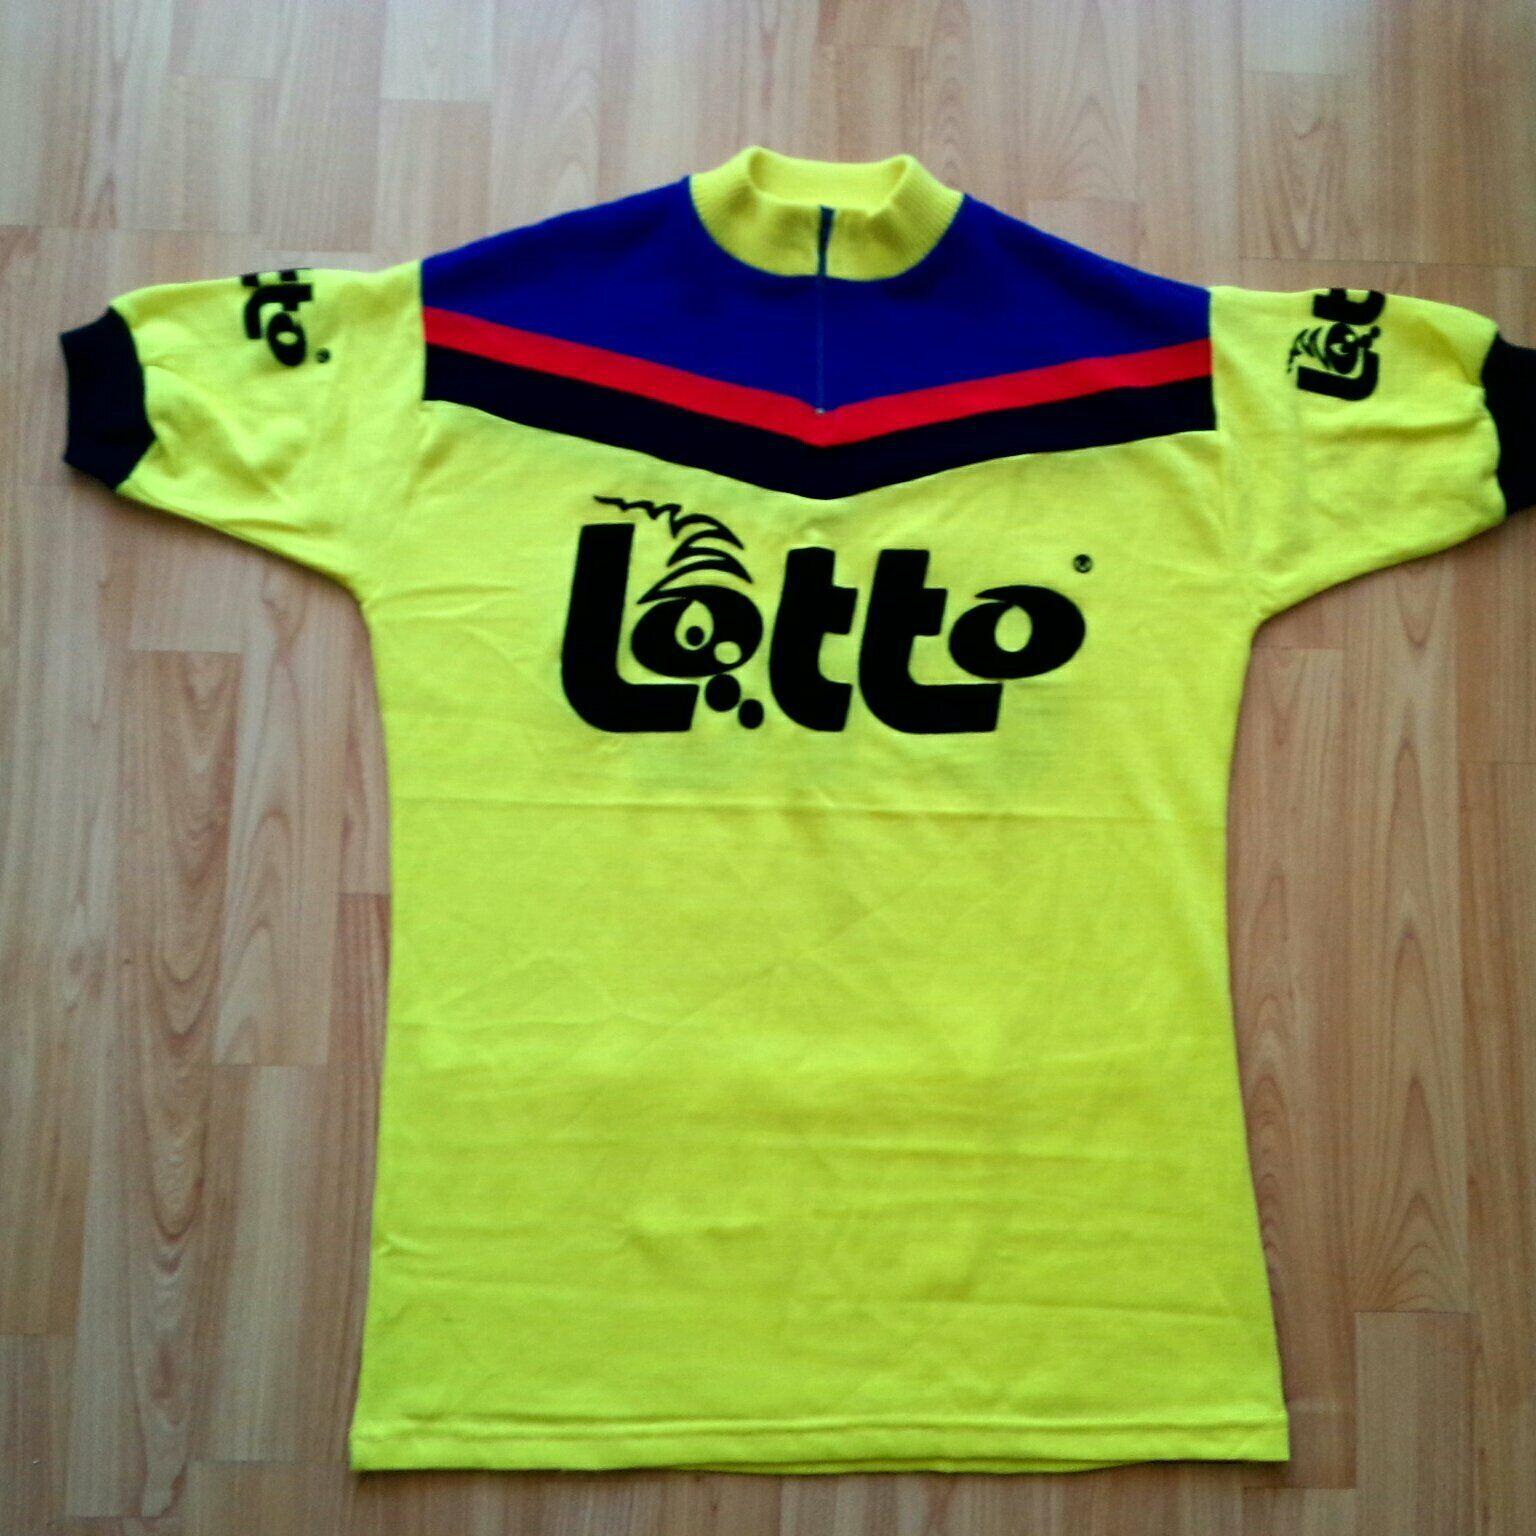 Vintage 70s Belgian Lotto Cycling Shirt Mens EL Gelb Flock Print ULTRA RARE